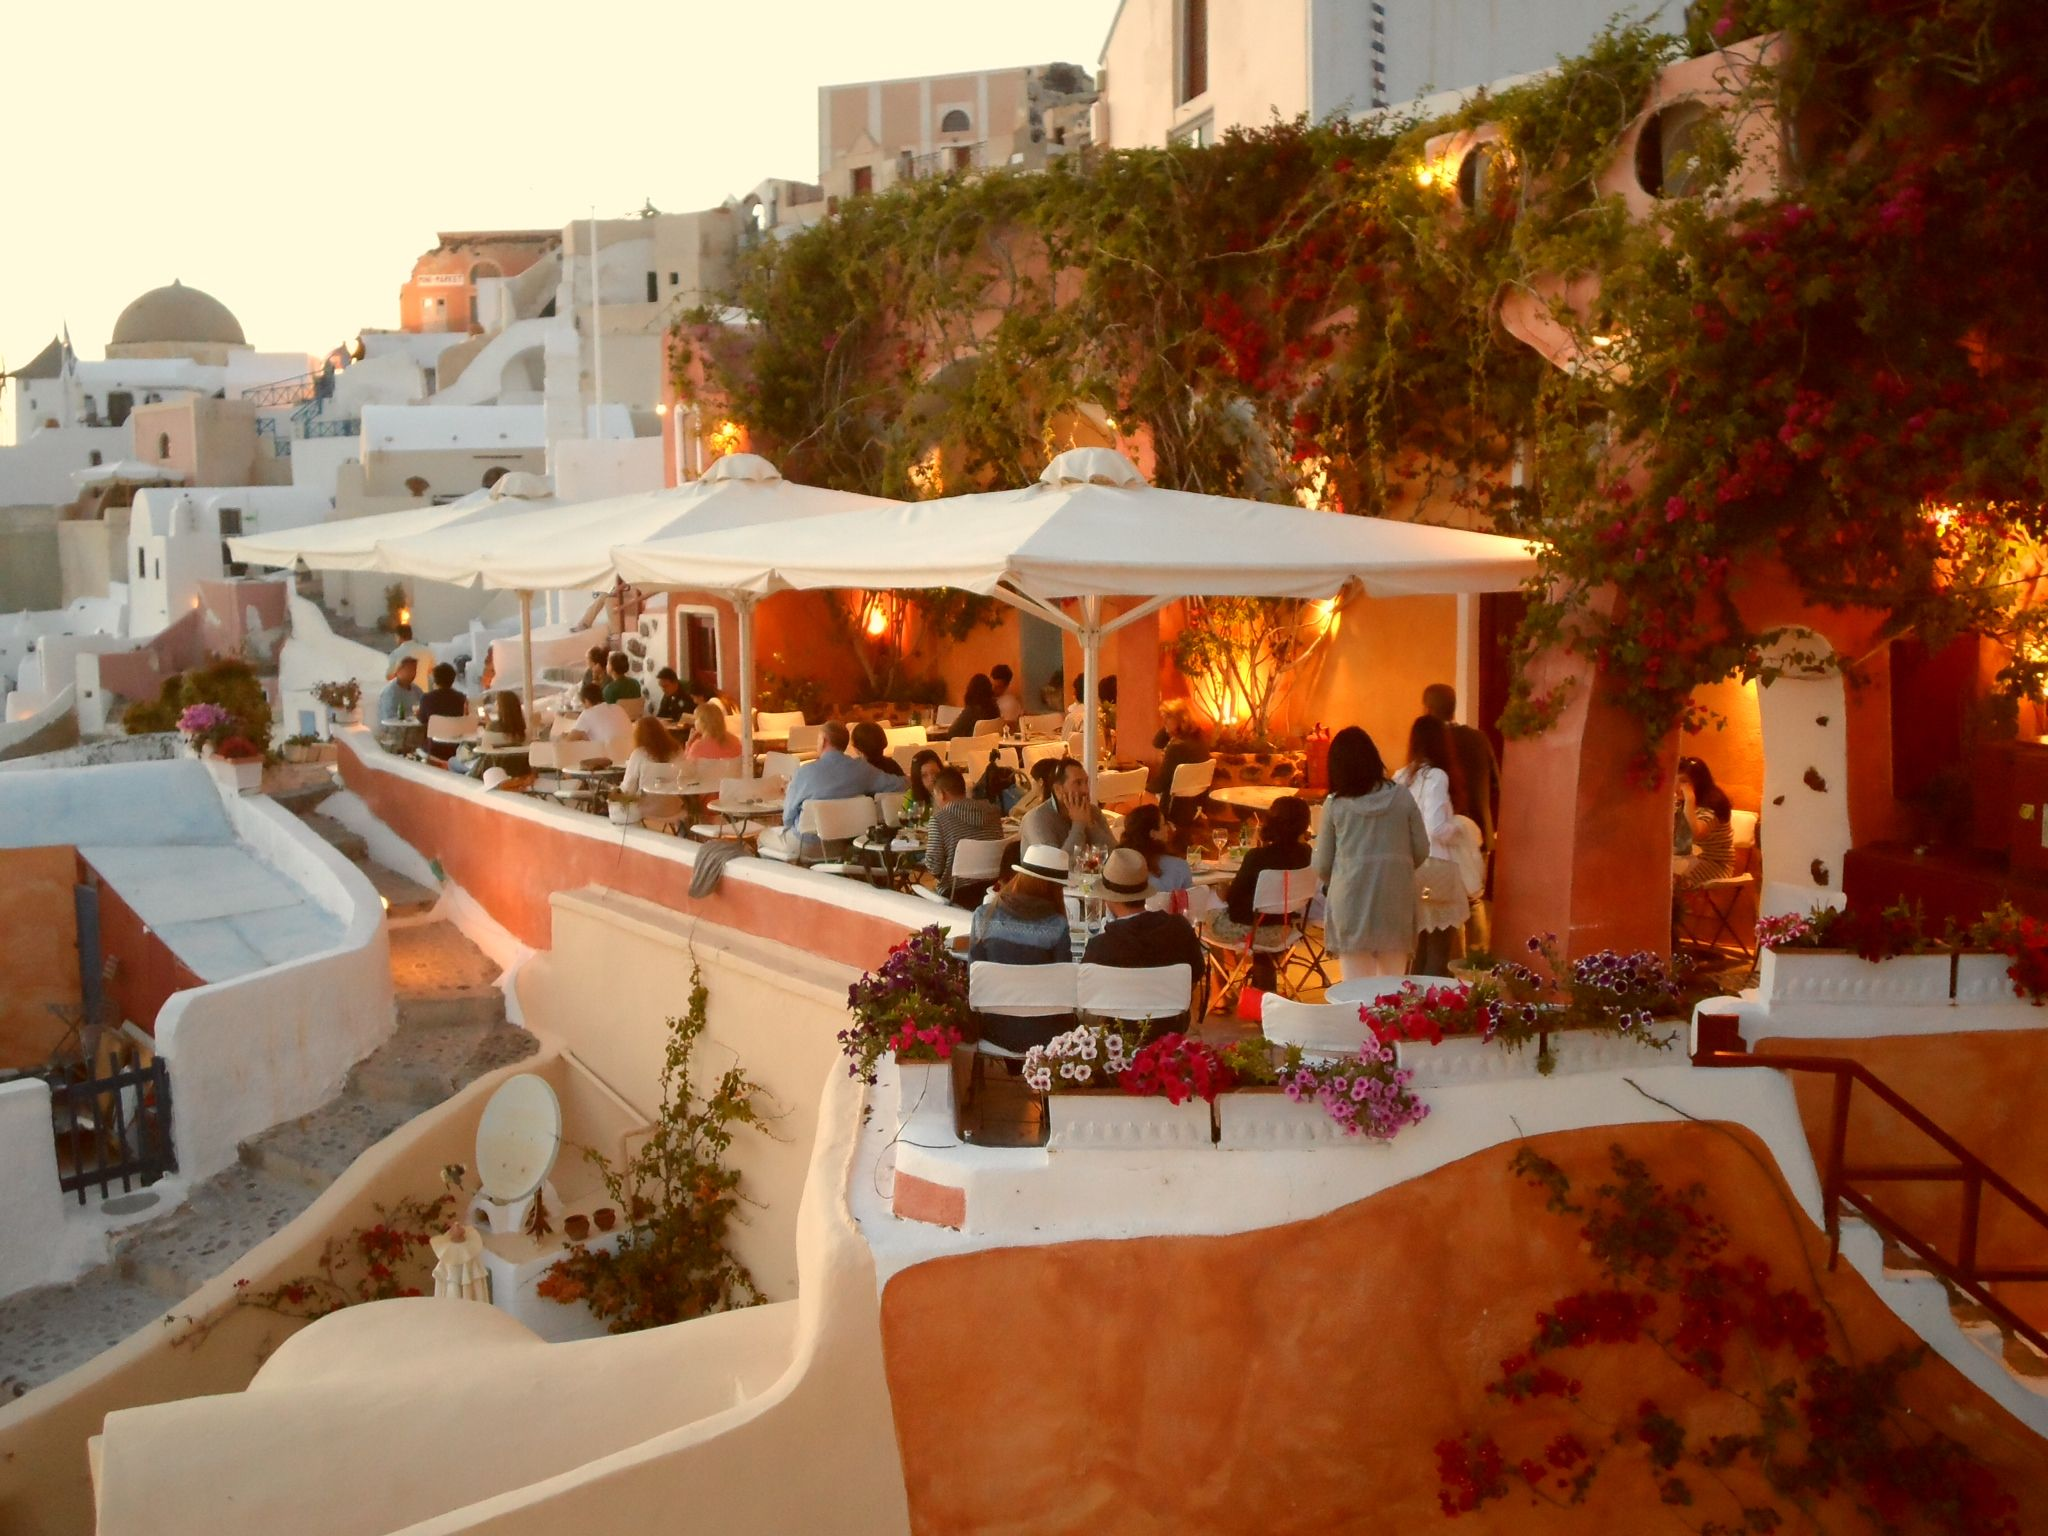 #Astartesuites #Santorini #Wedding - Santorini Weddings  Astarte Suites -